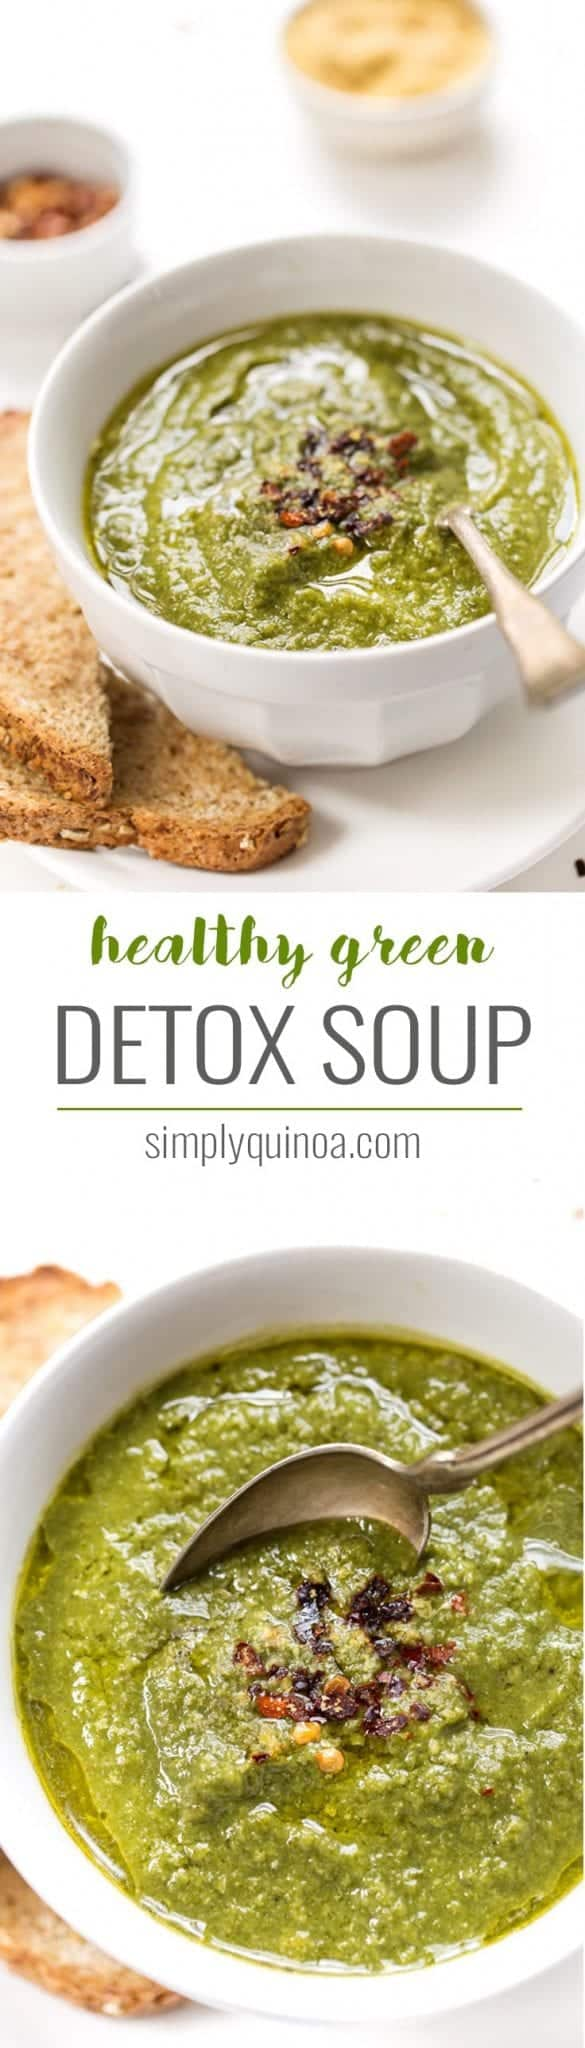 a healthy green detox soup